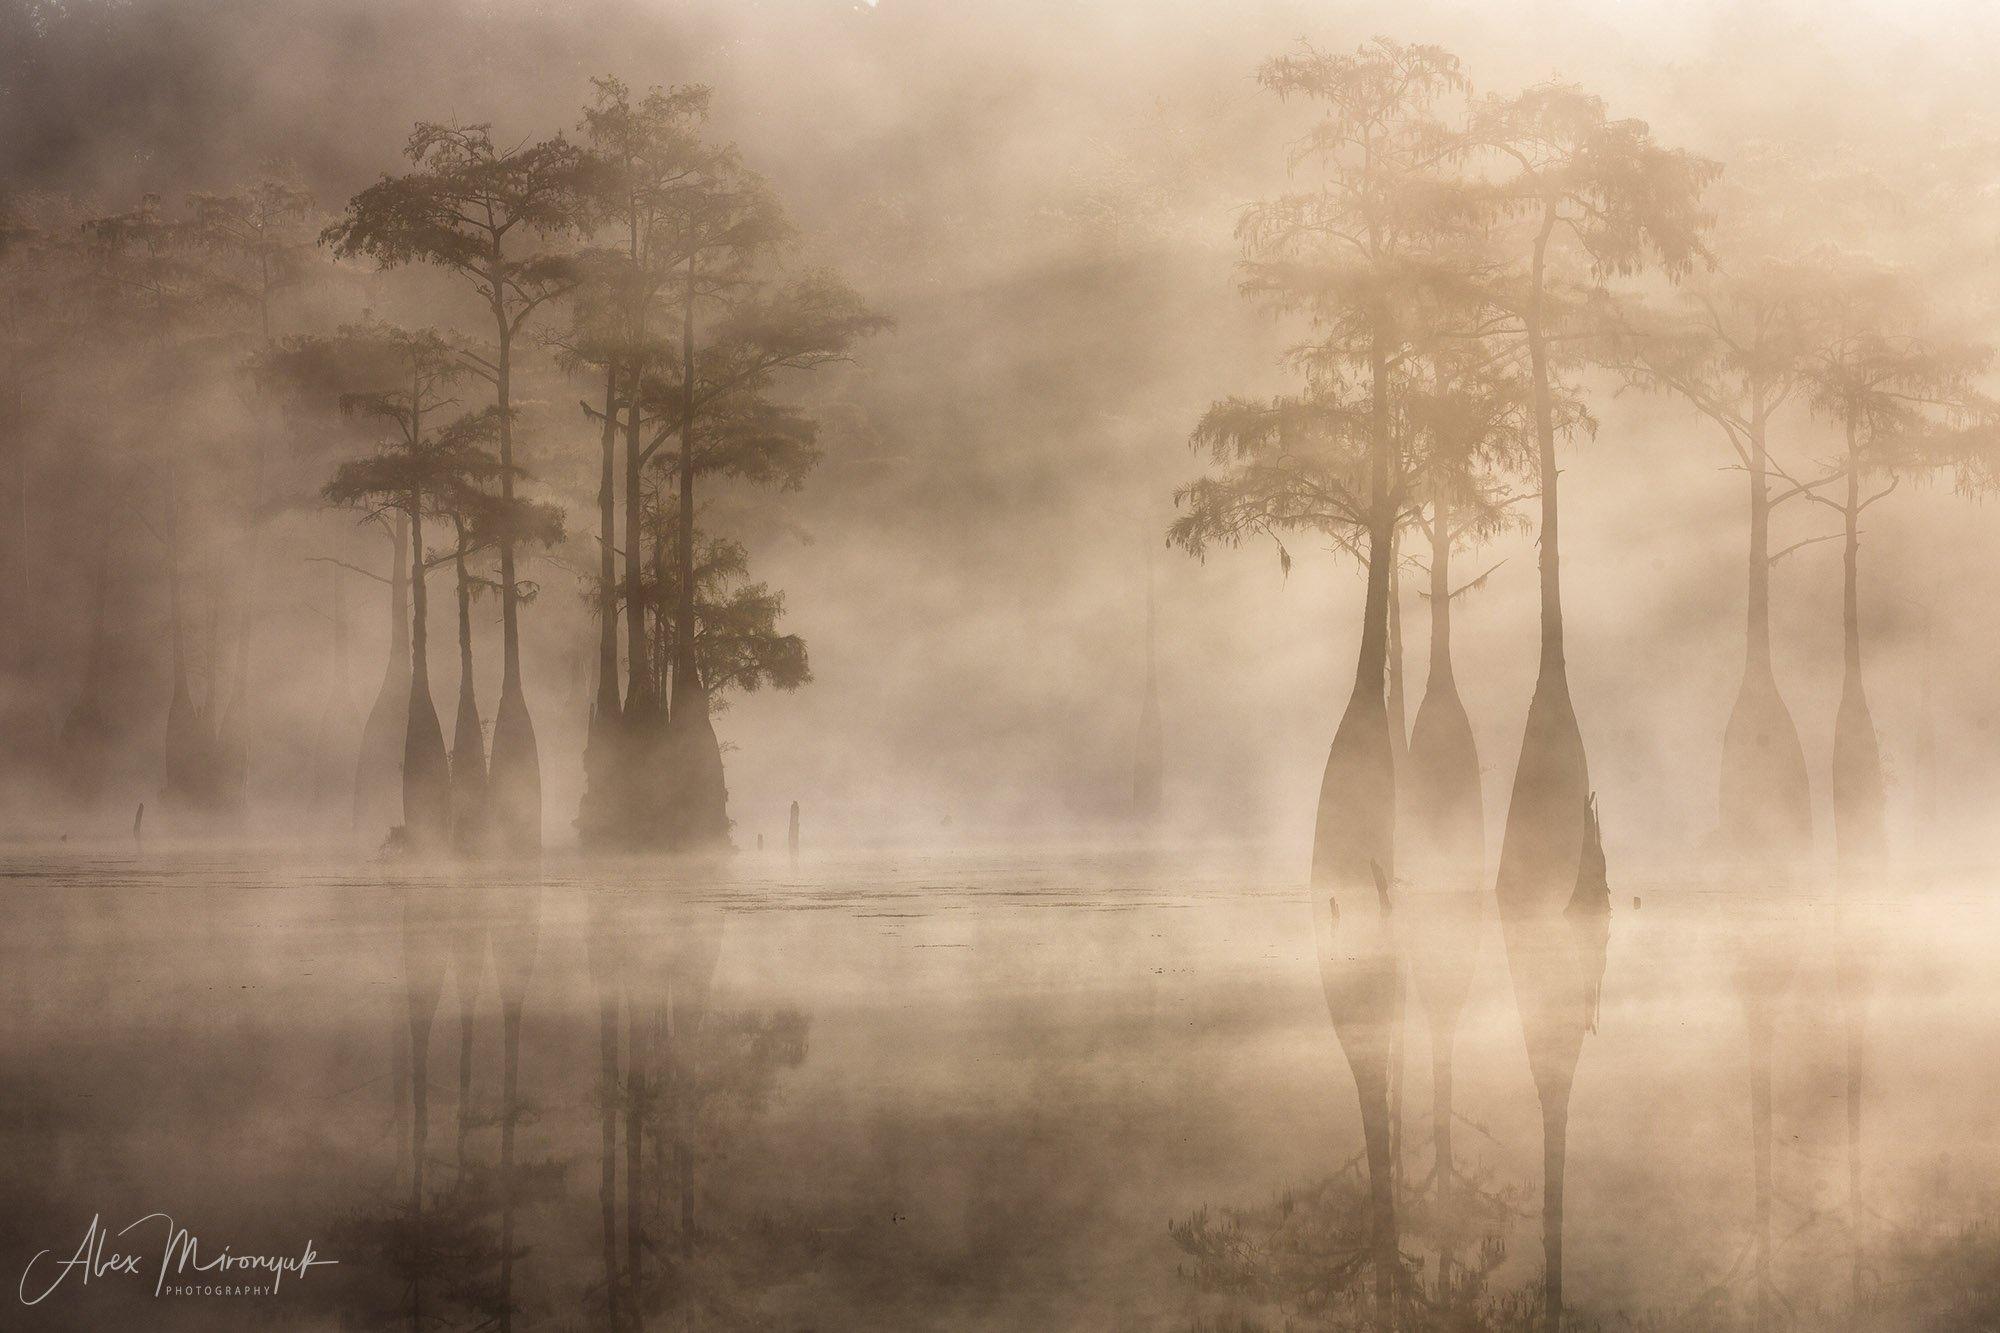 кипарис, болото, озеро, отражение, вода, туман, утро, осень, фото-тур, США, Mironyuk Alex